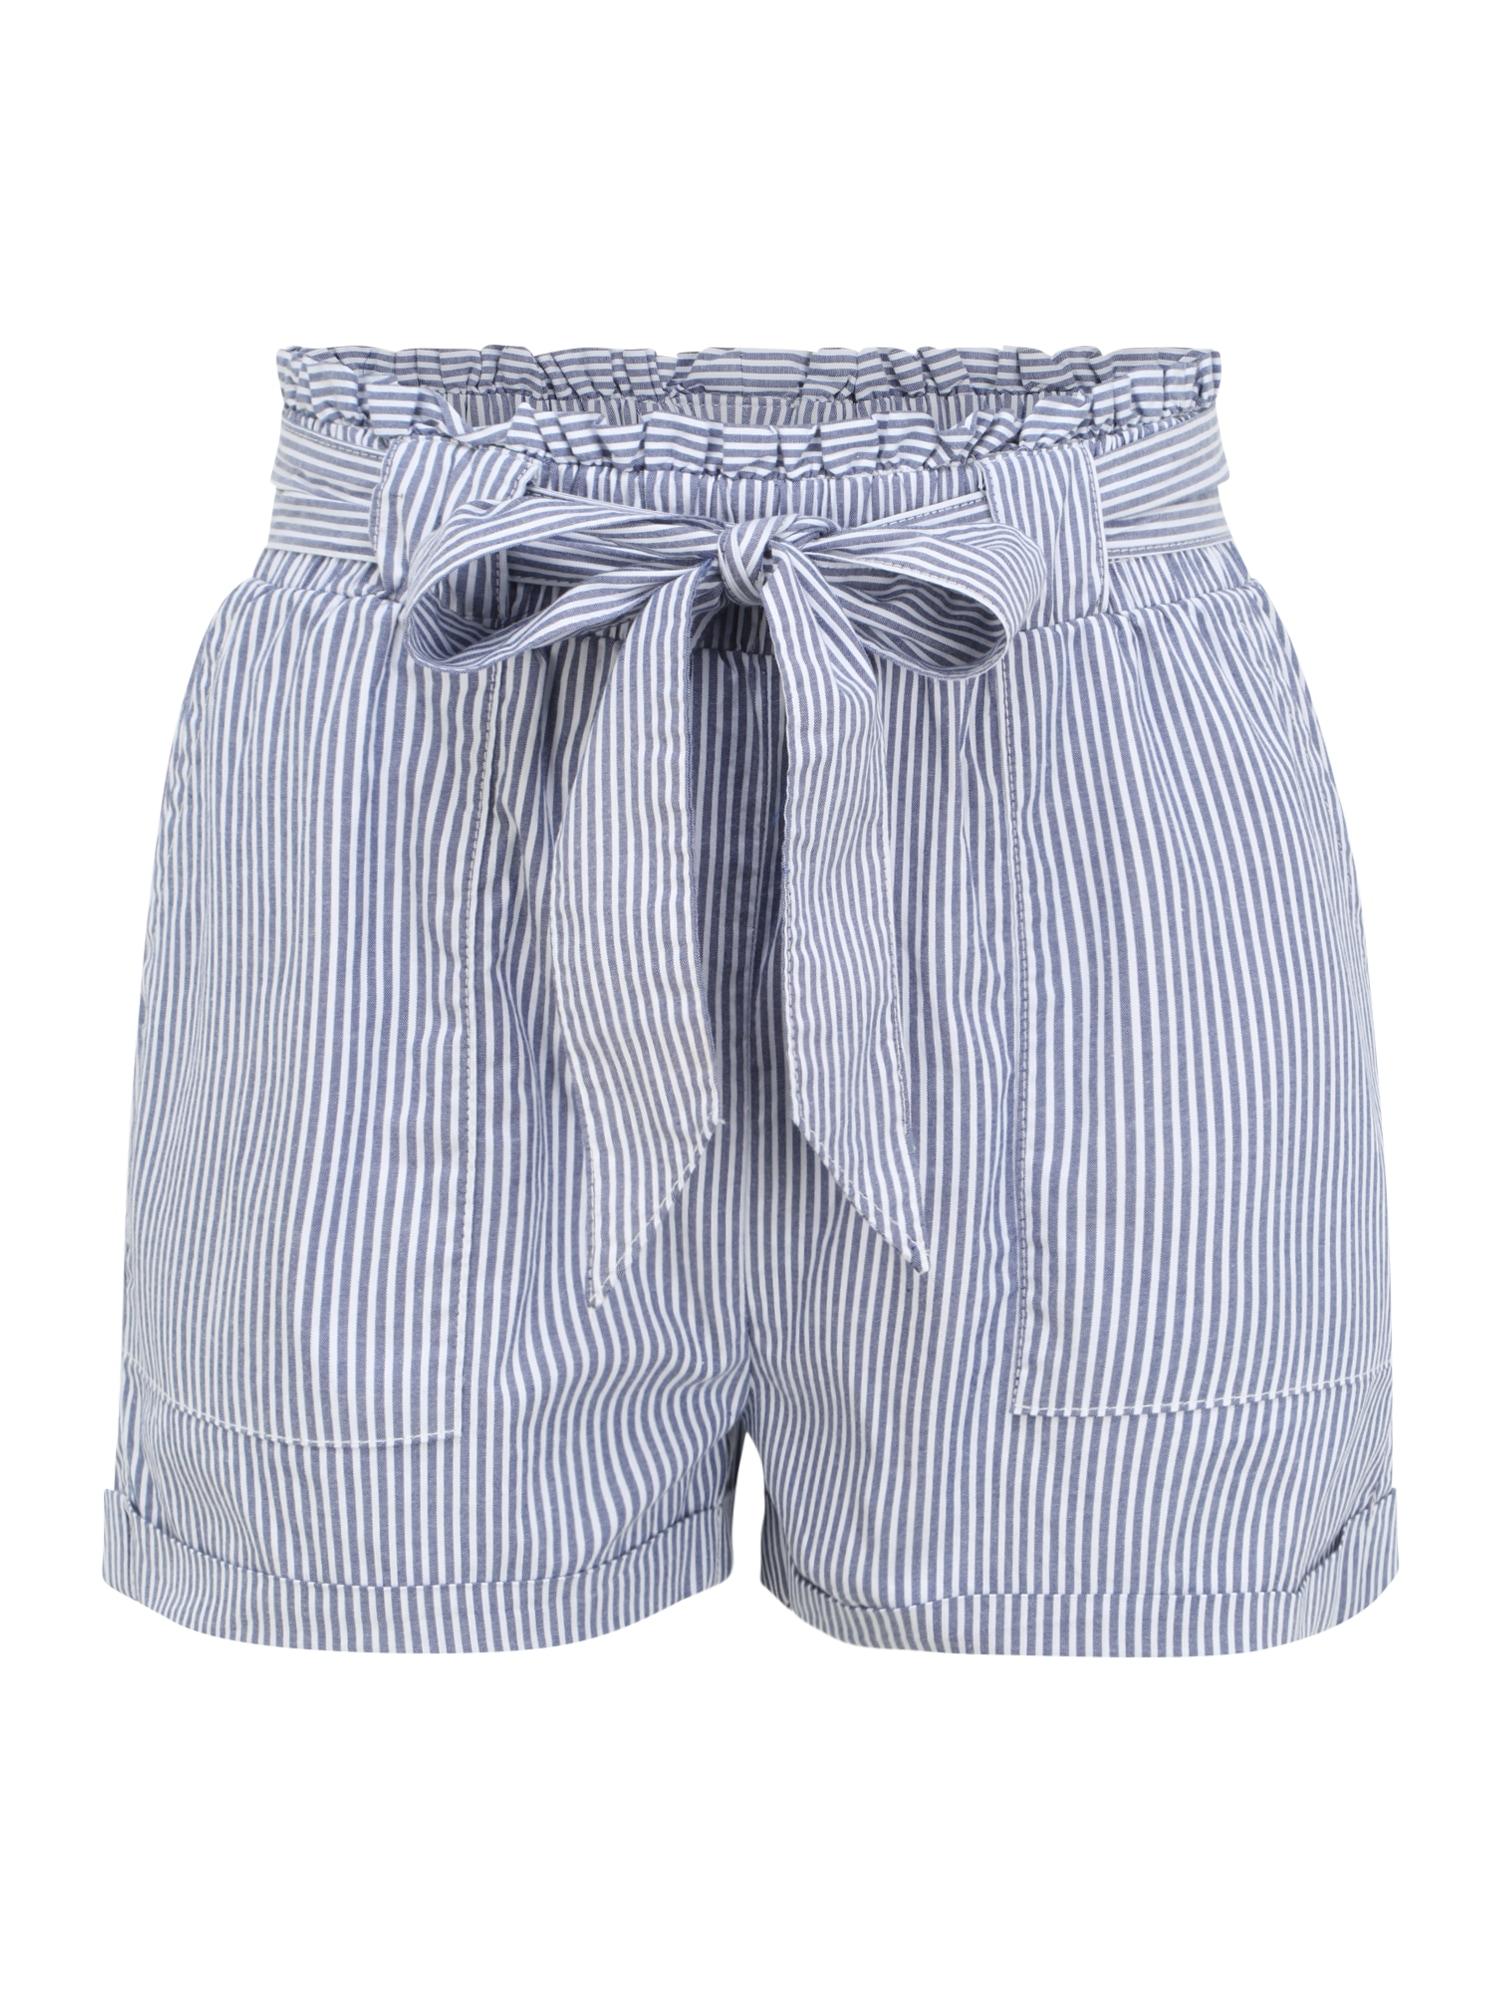 Only (Petite) Kelnės